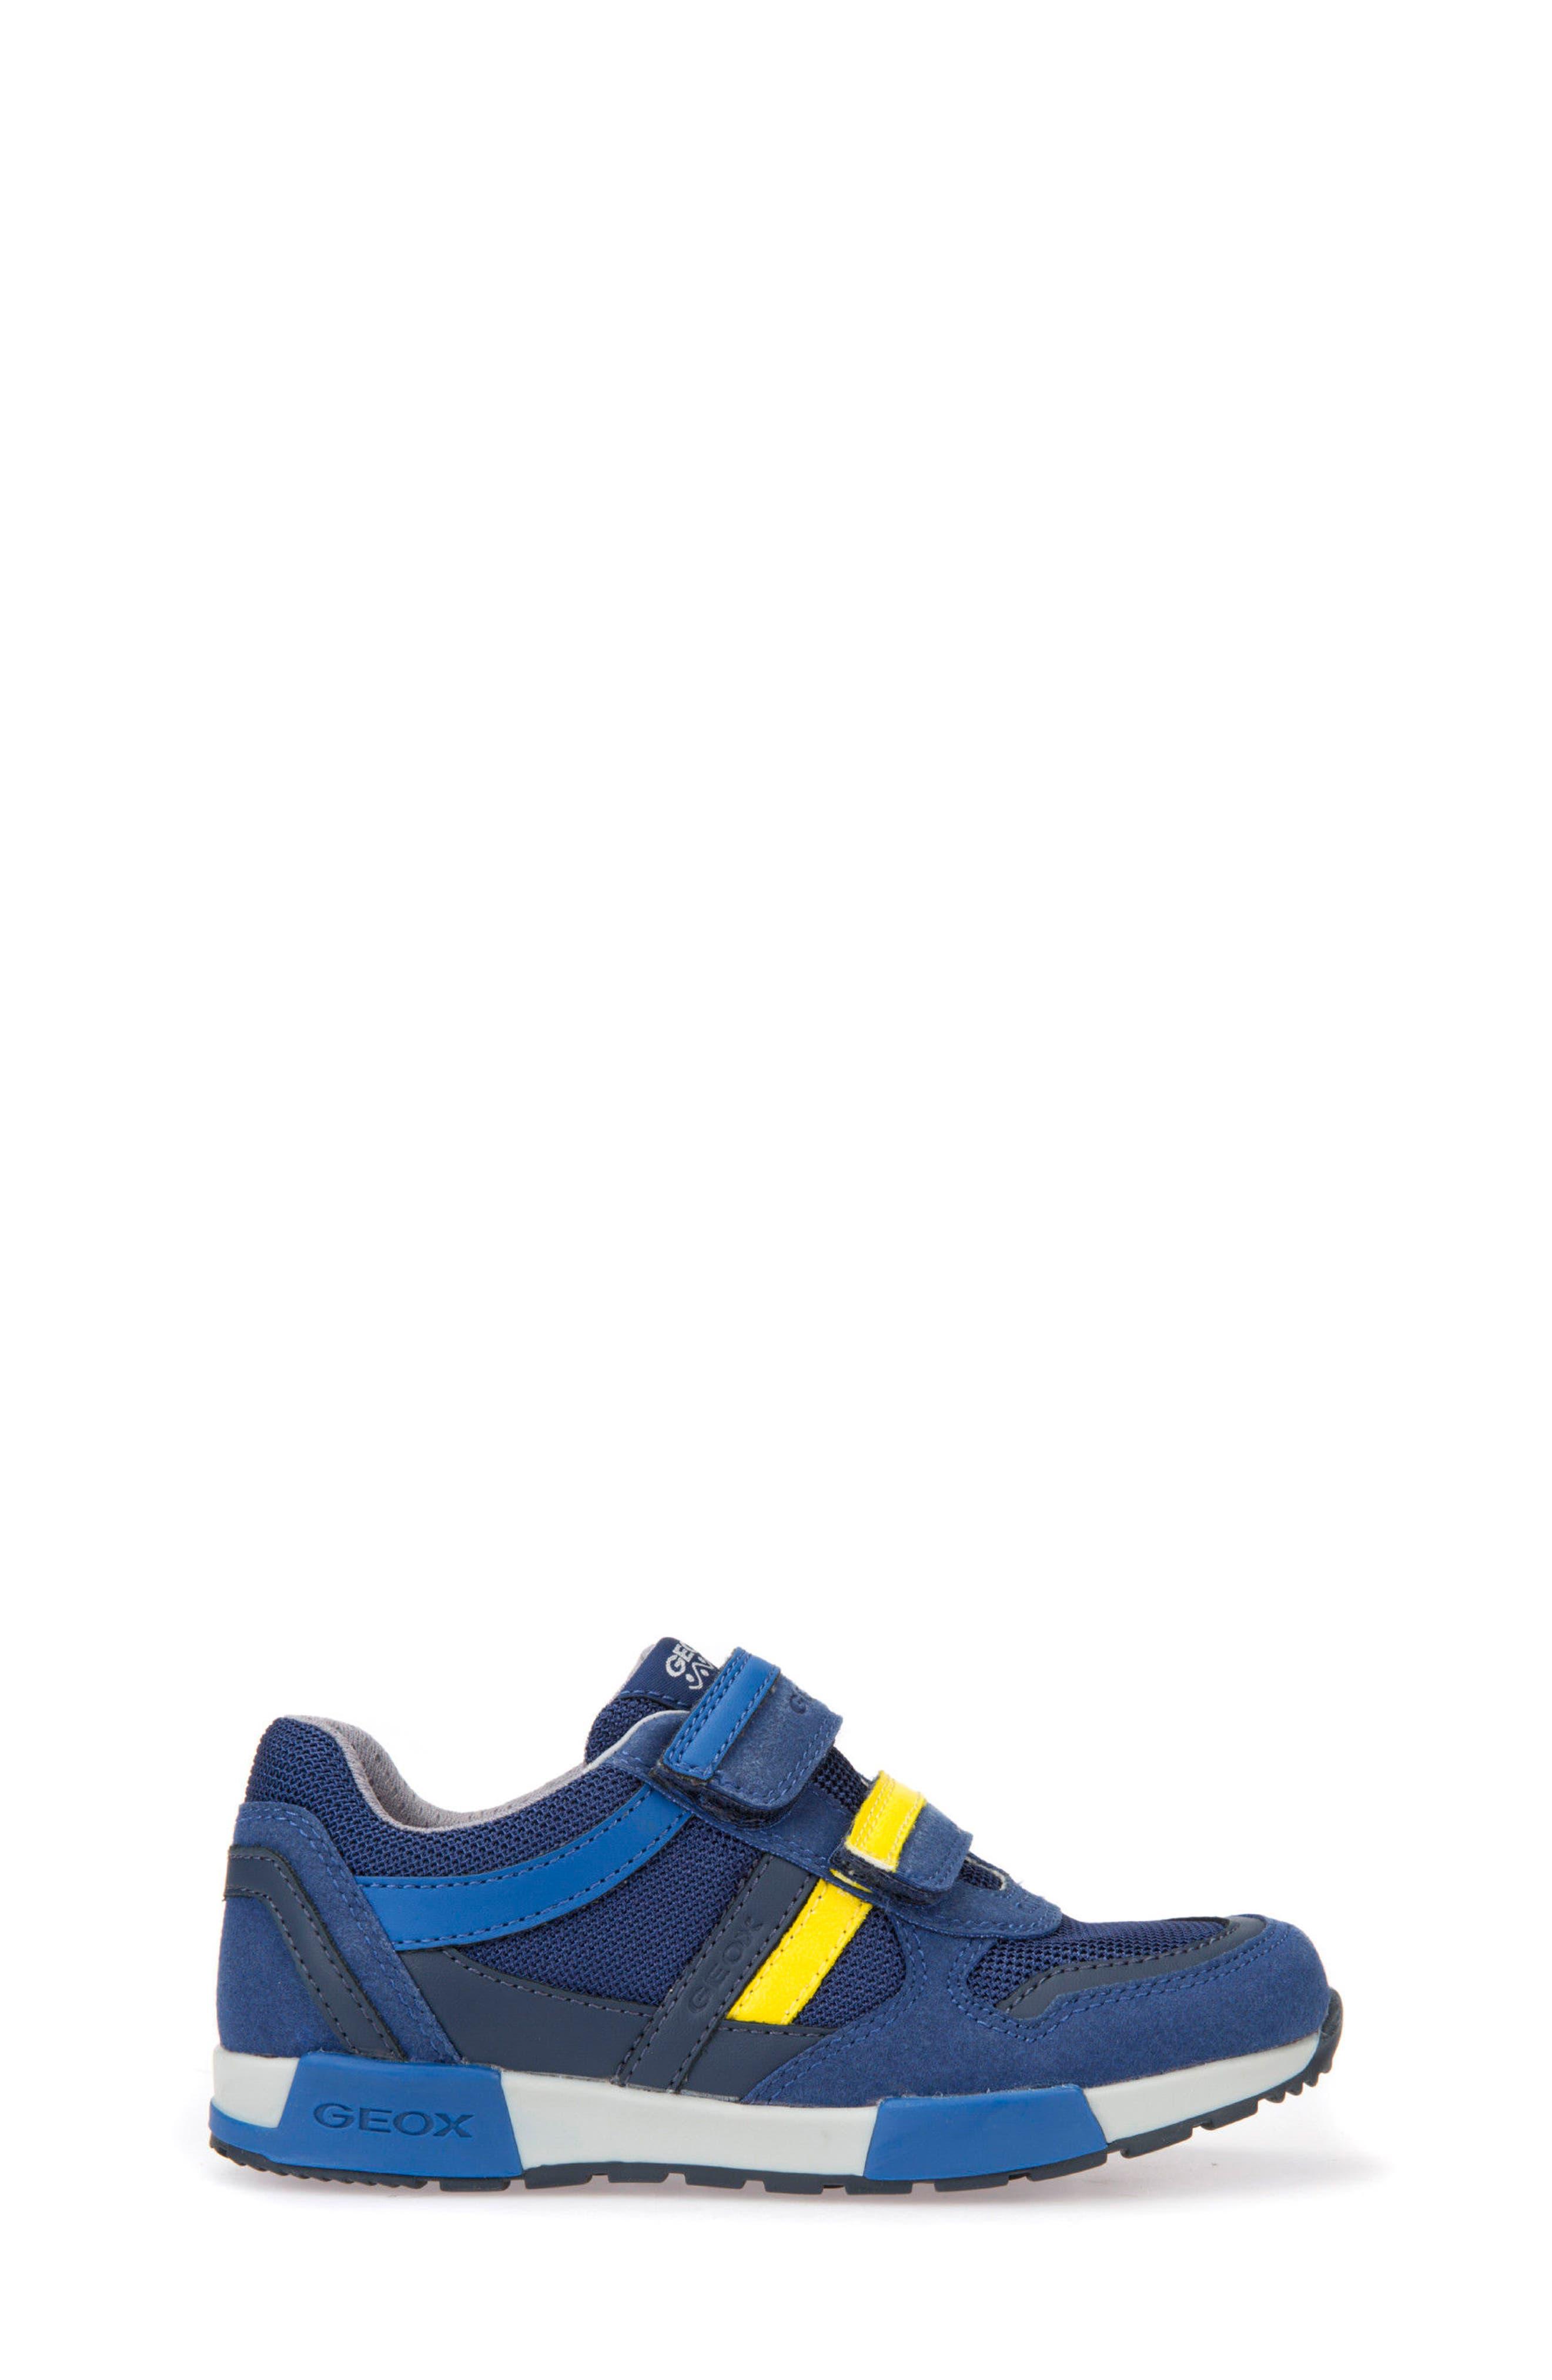 Alfier Stripe Low Top Sneaker,                             Alternate thumbnail 3, color,                             Blue/ Yellow